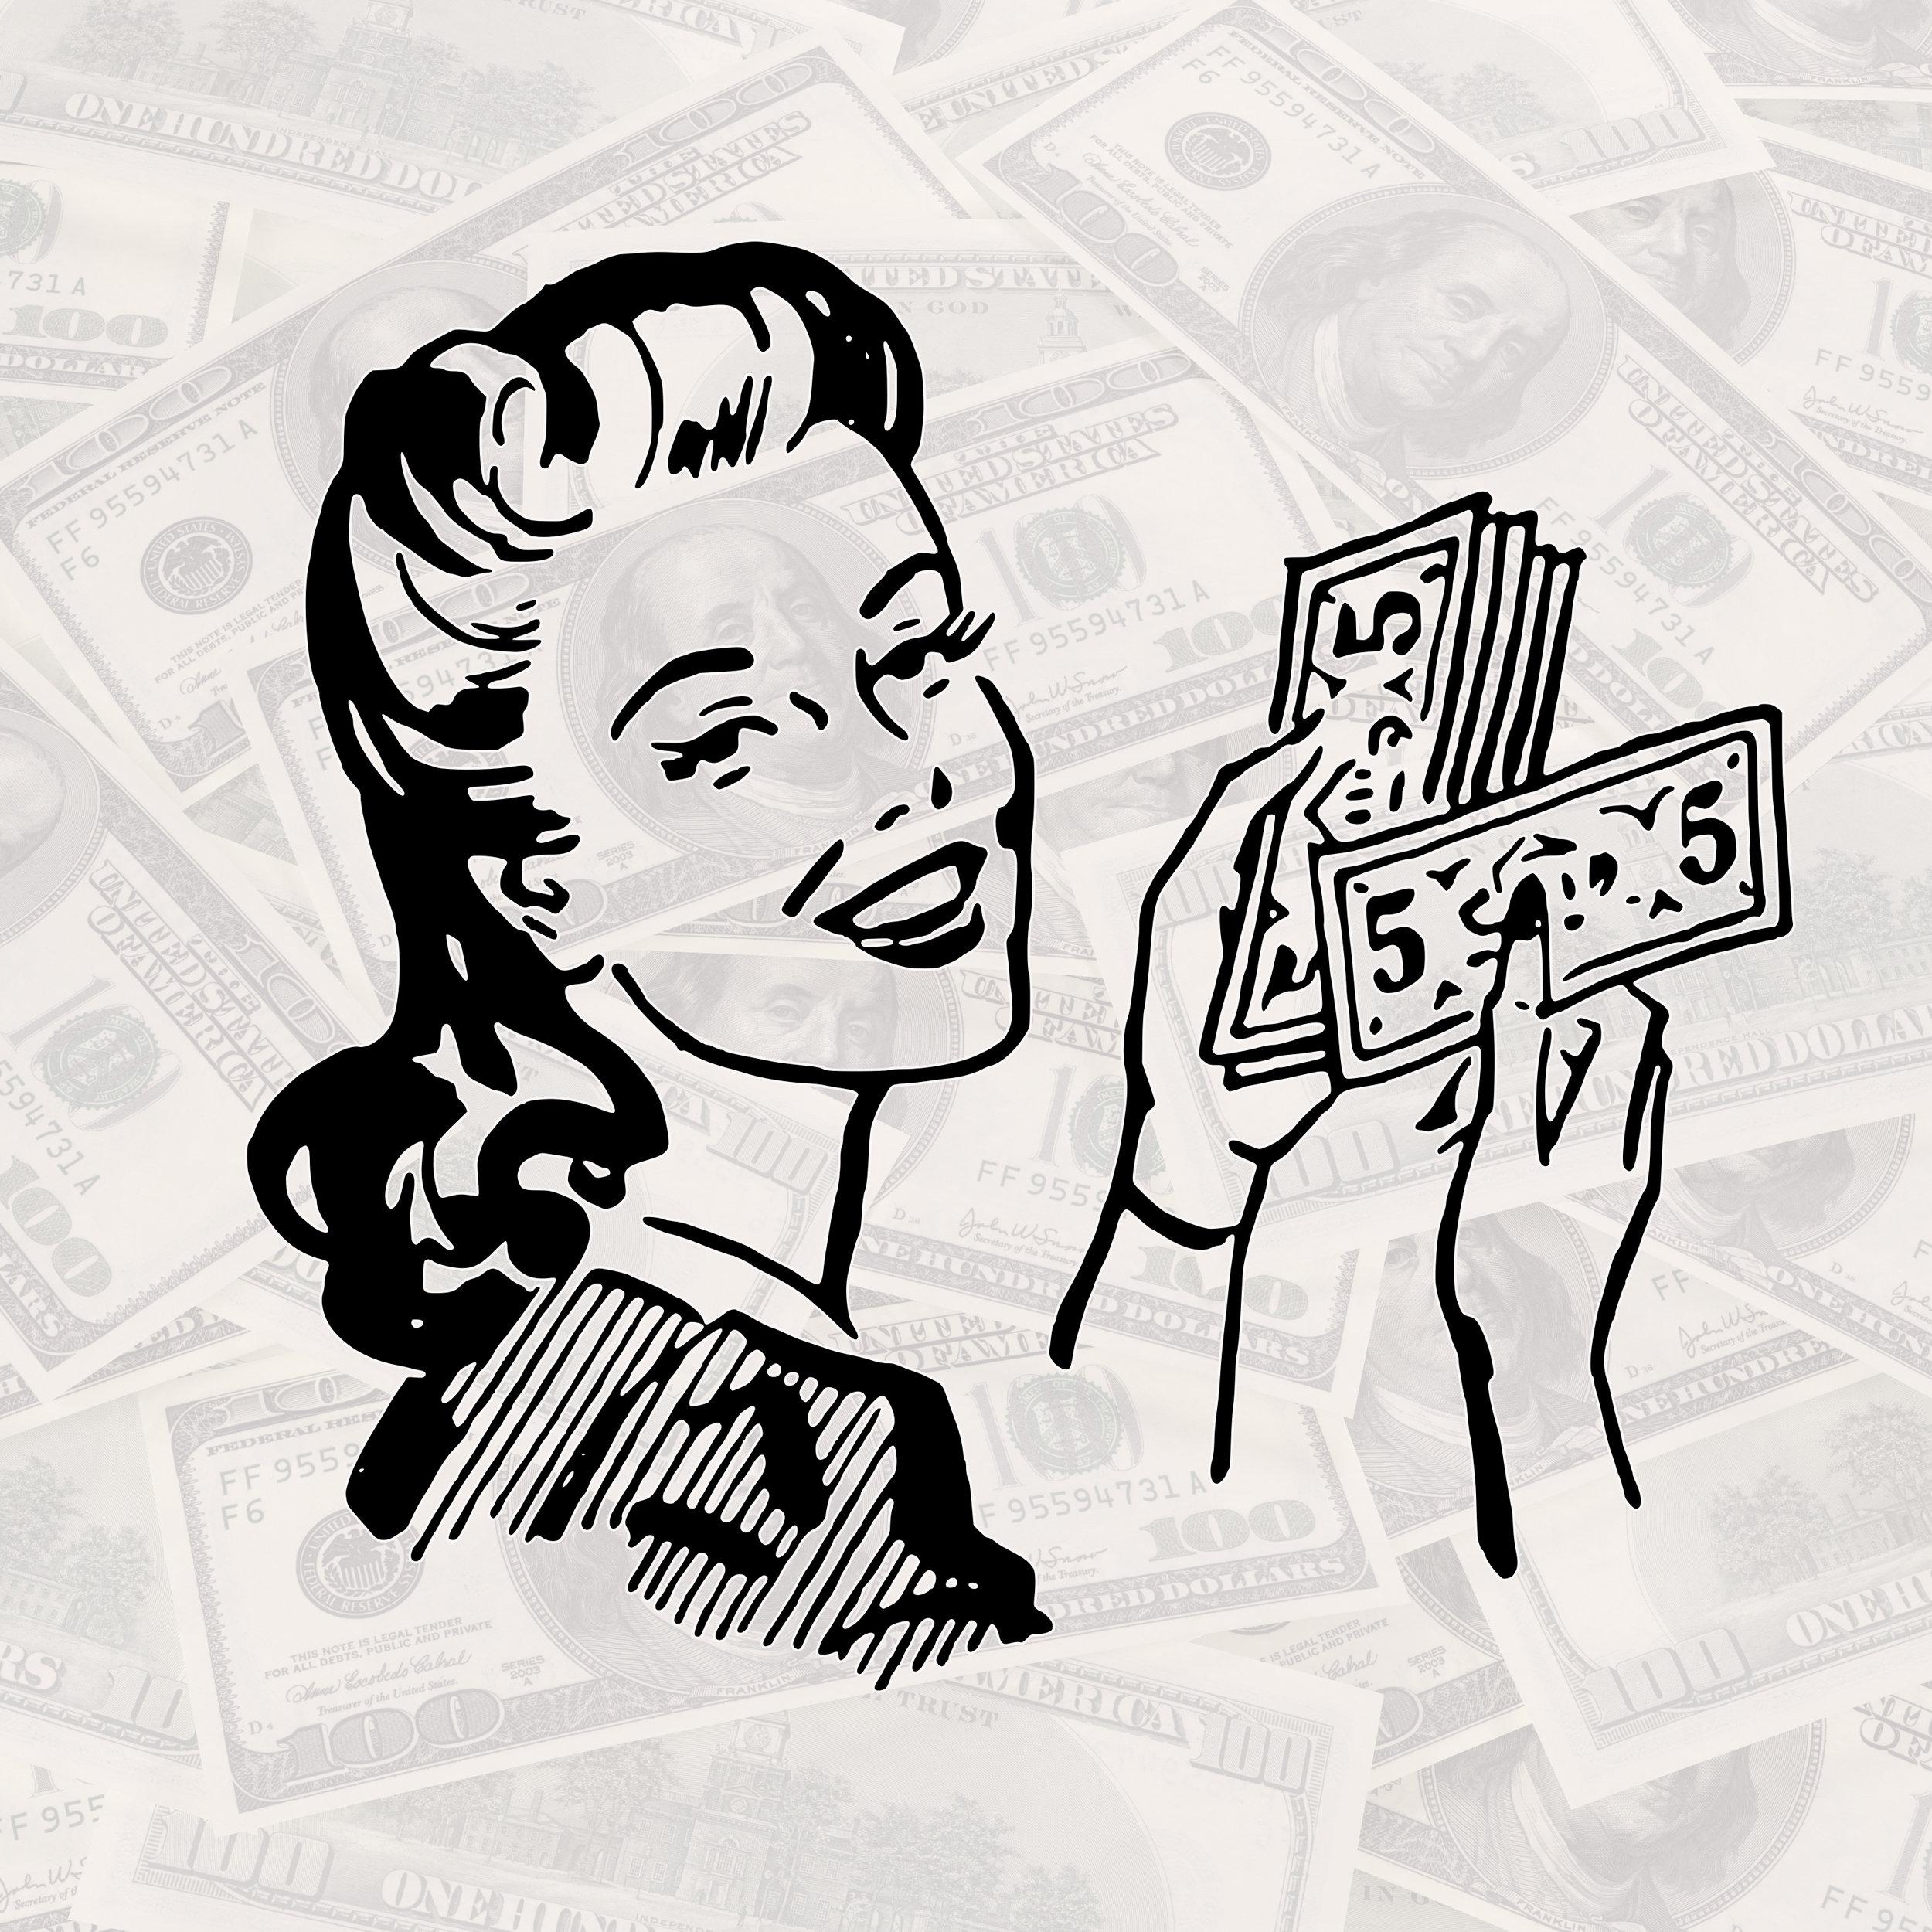 [OFDM016] DISCO DIKC - That Money Make Her.jpg